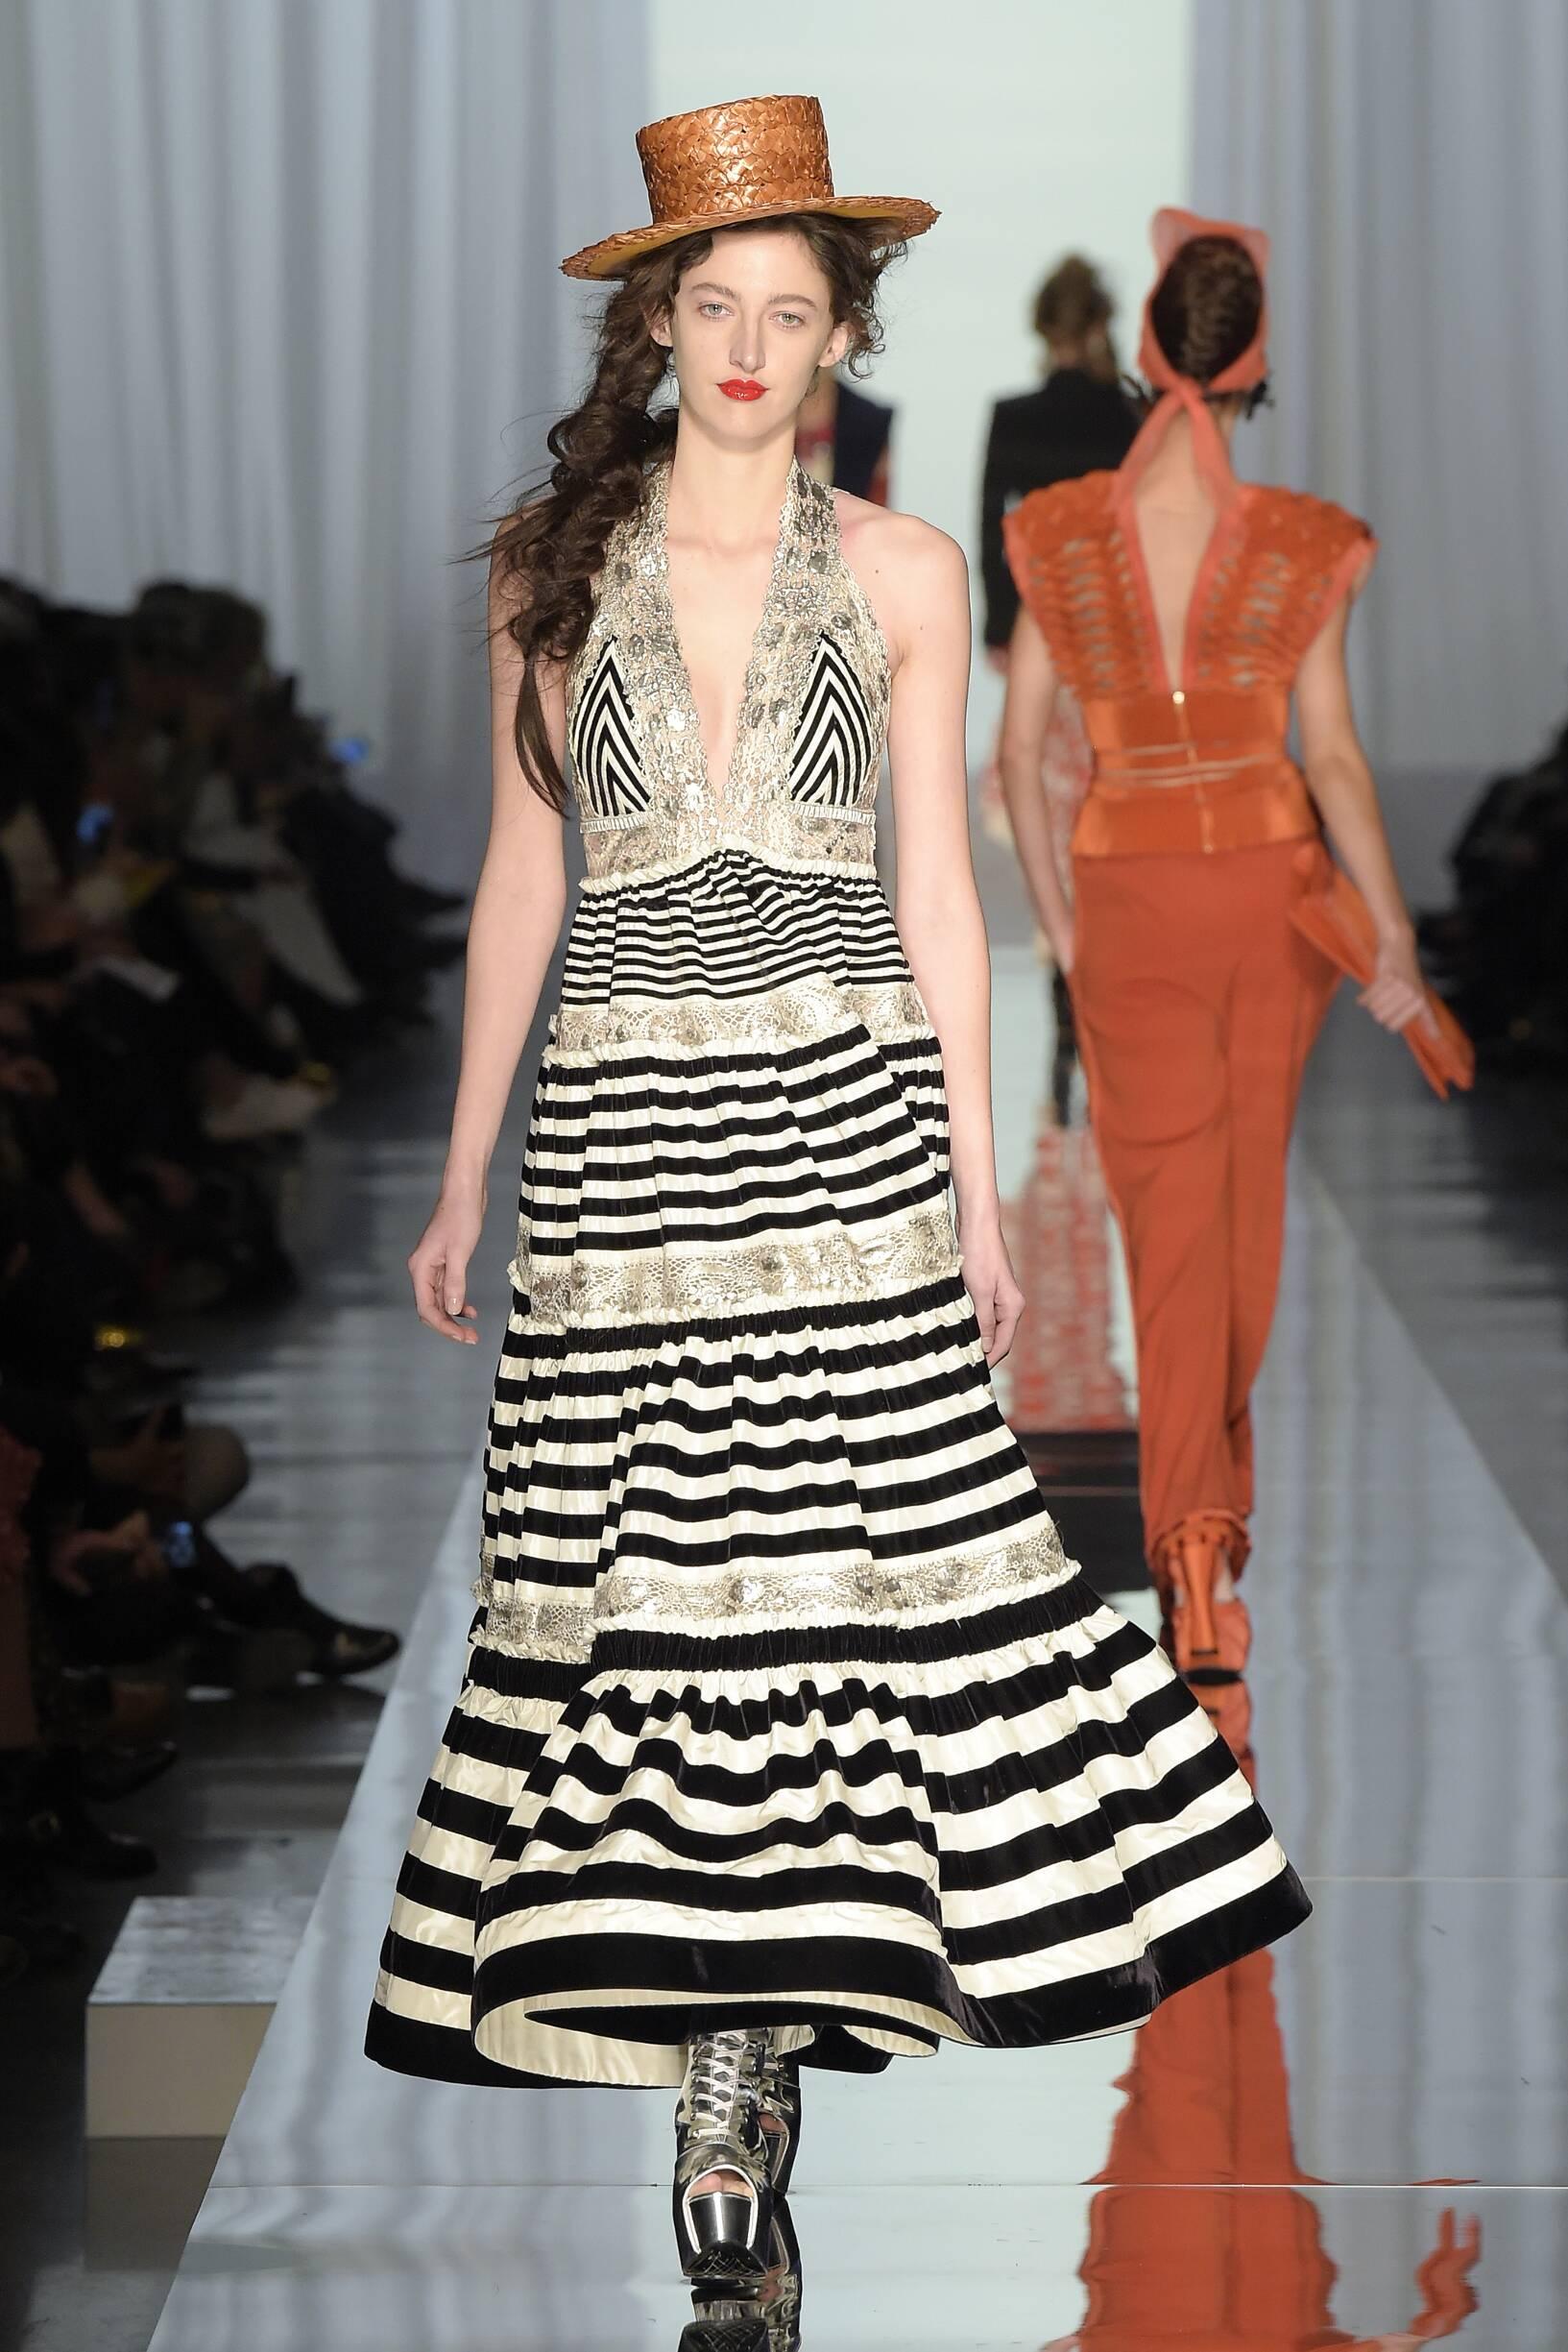 Jean Paul Gaultier Haute Couture Woman Spring 2018 Catwalk